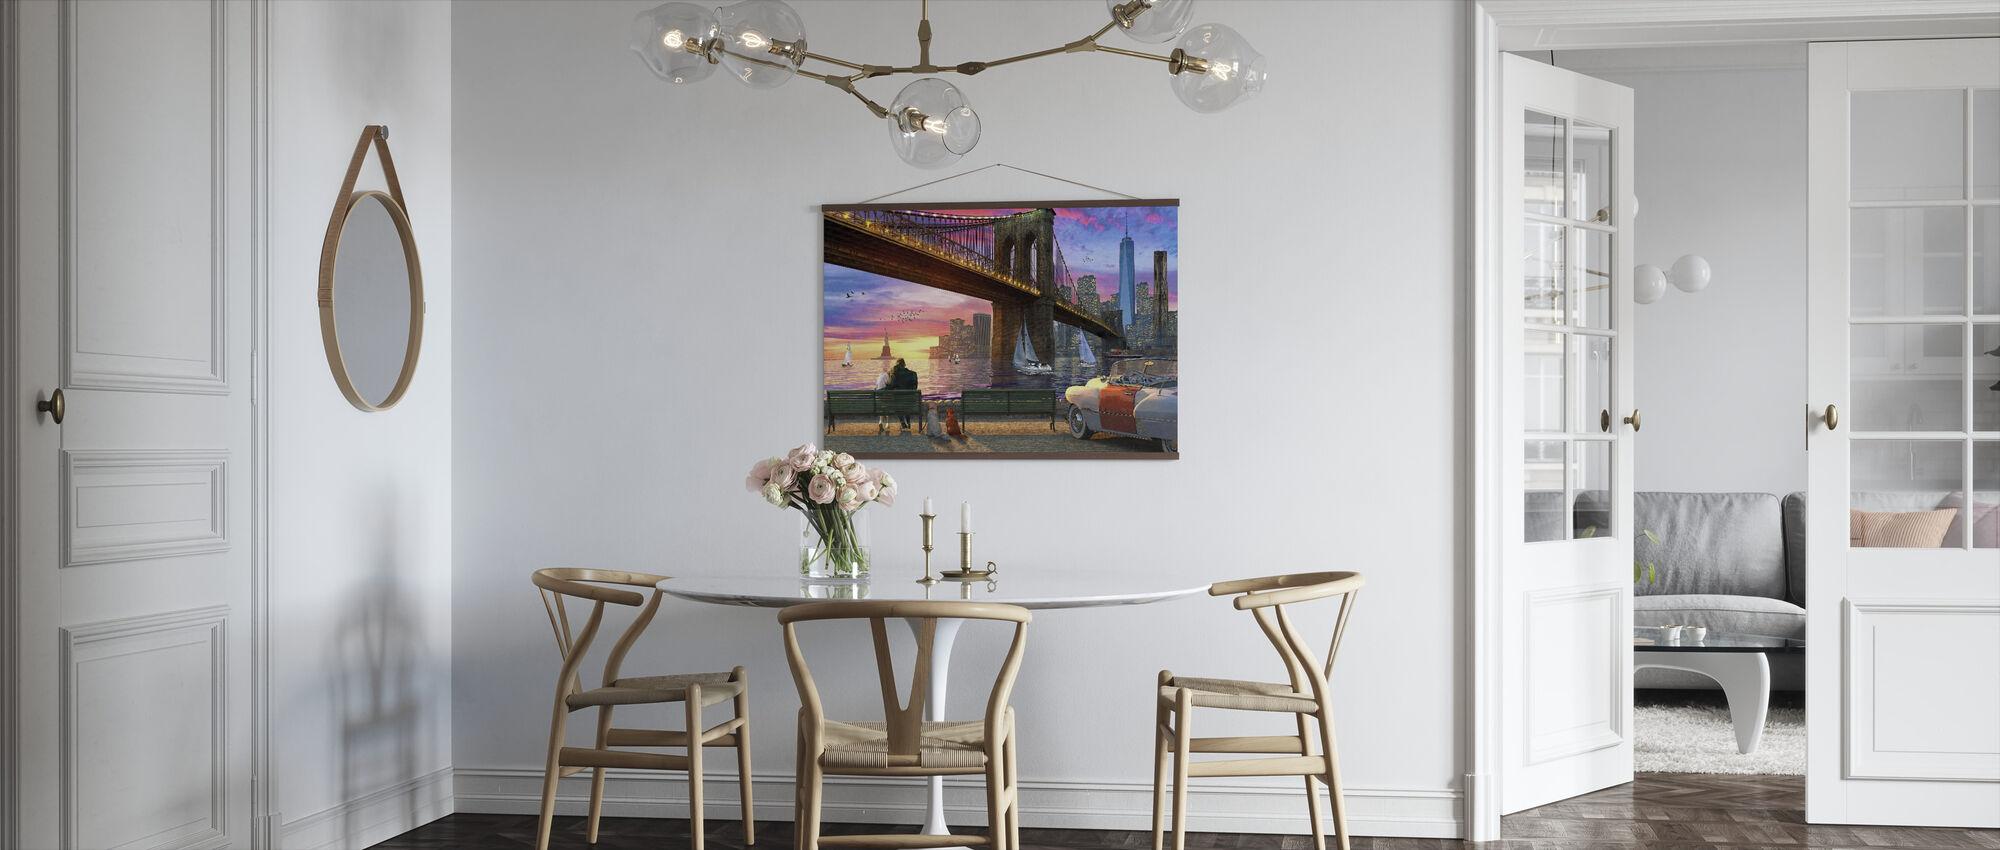 The NY Romance - Poster - Kitchen